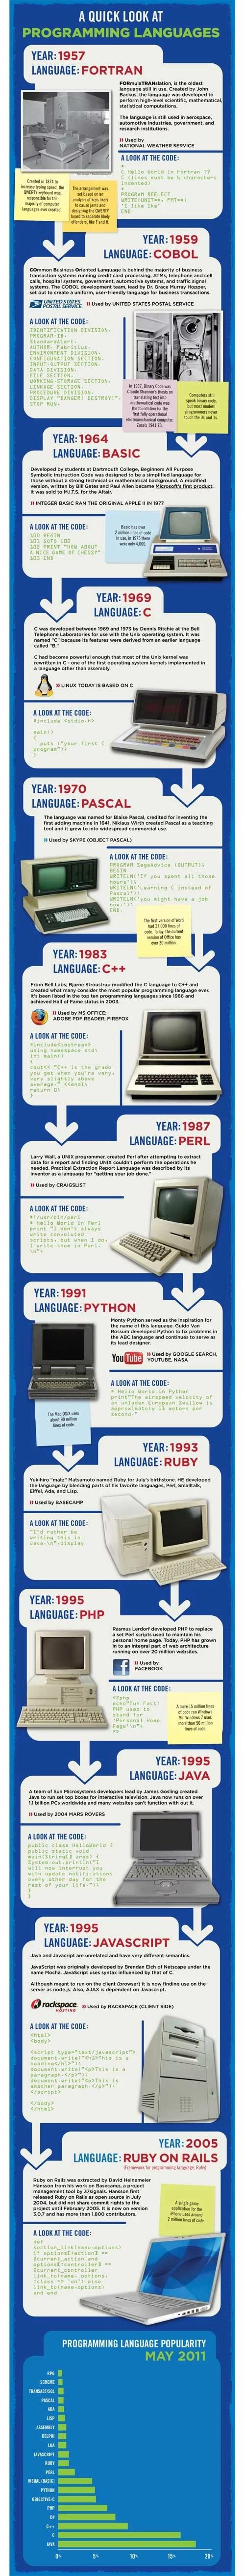 evolution of computer programming